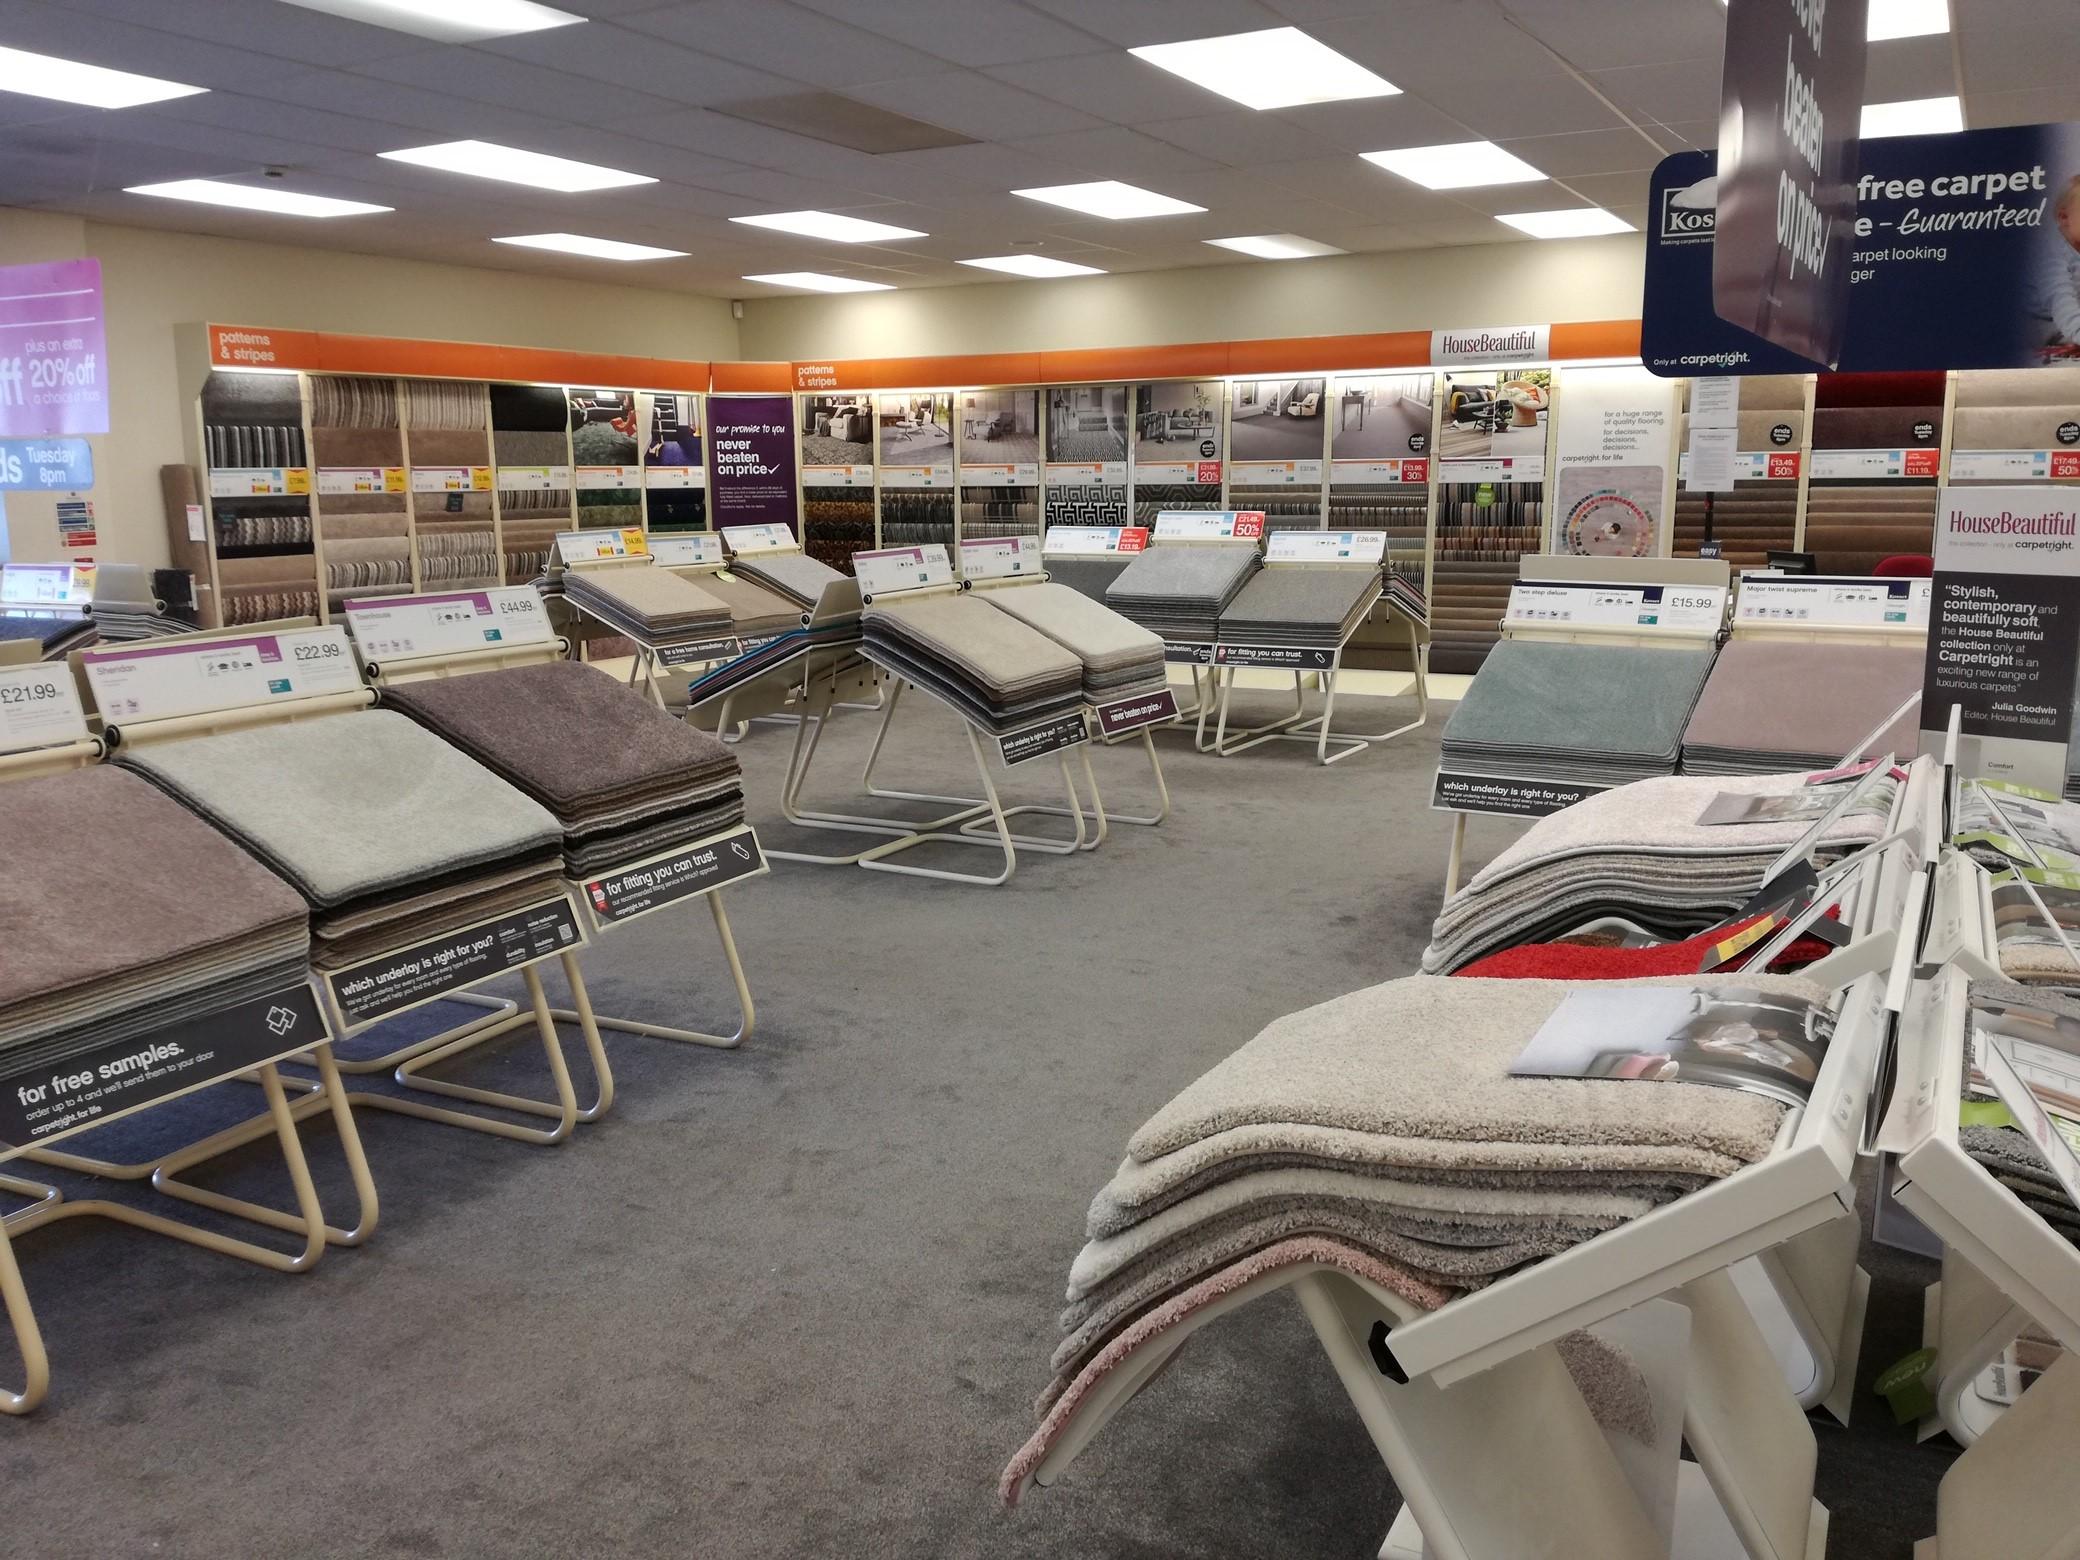 Luxury Carpets And Flooring Blackburn Frameimage Org